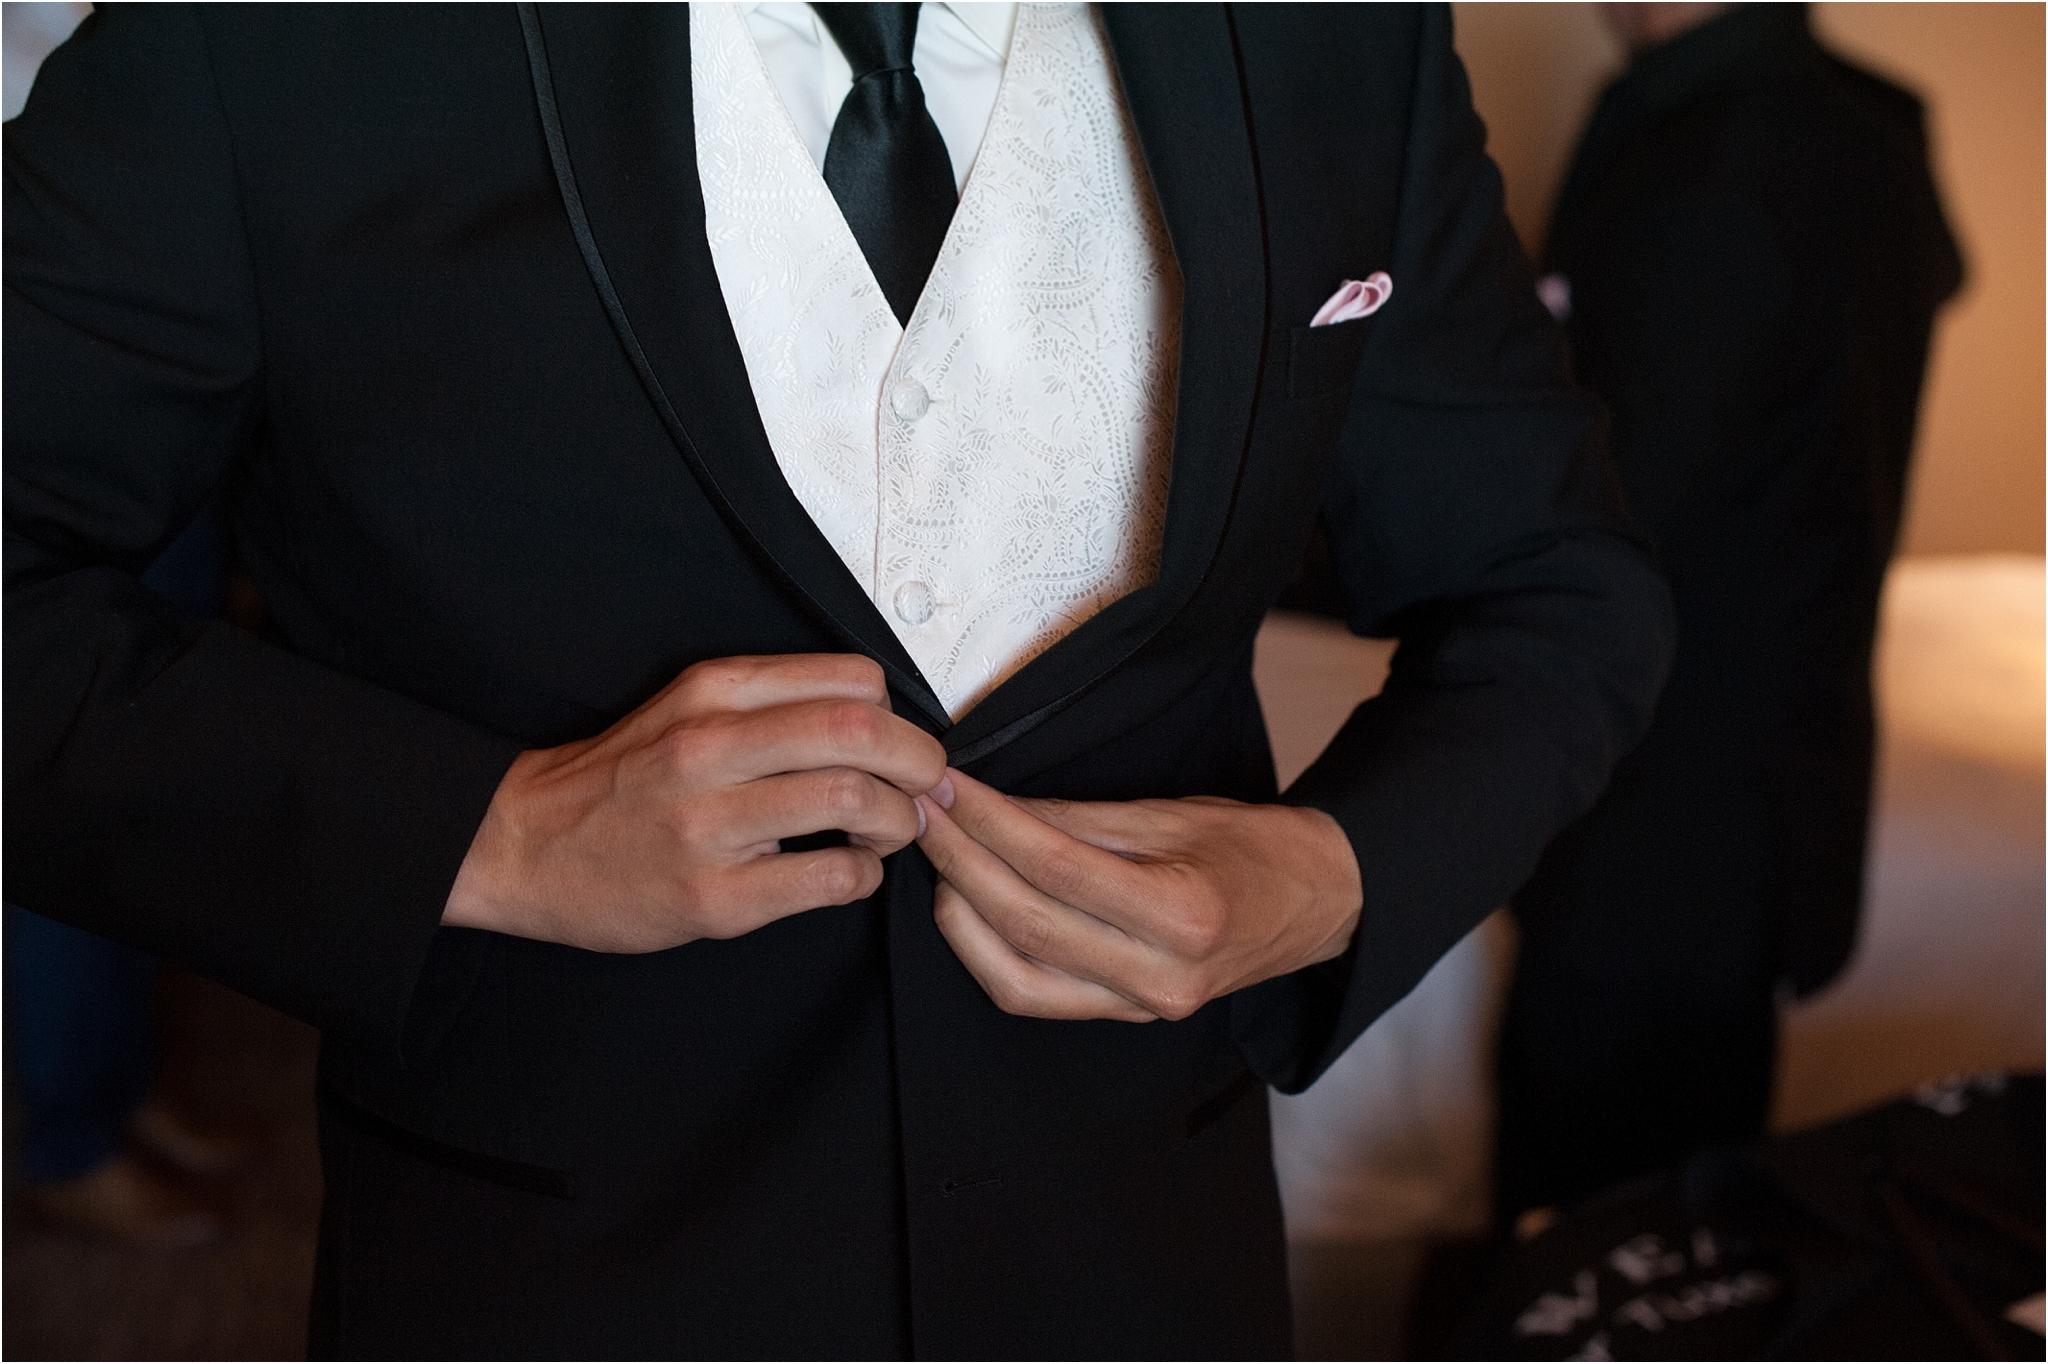 kayla kitts photography - isleta casino wedding - albuquerque wedding photographer - new mexico wedding photographer - de novo pastoral_0016.jpg